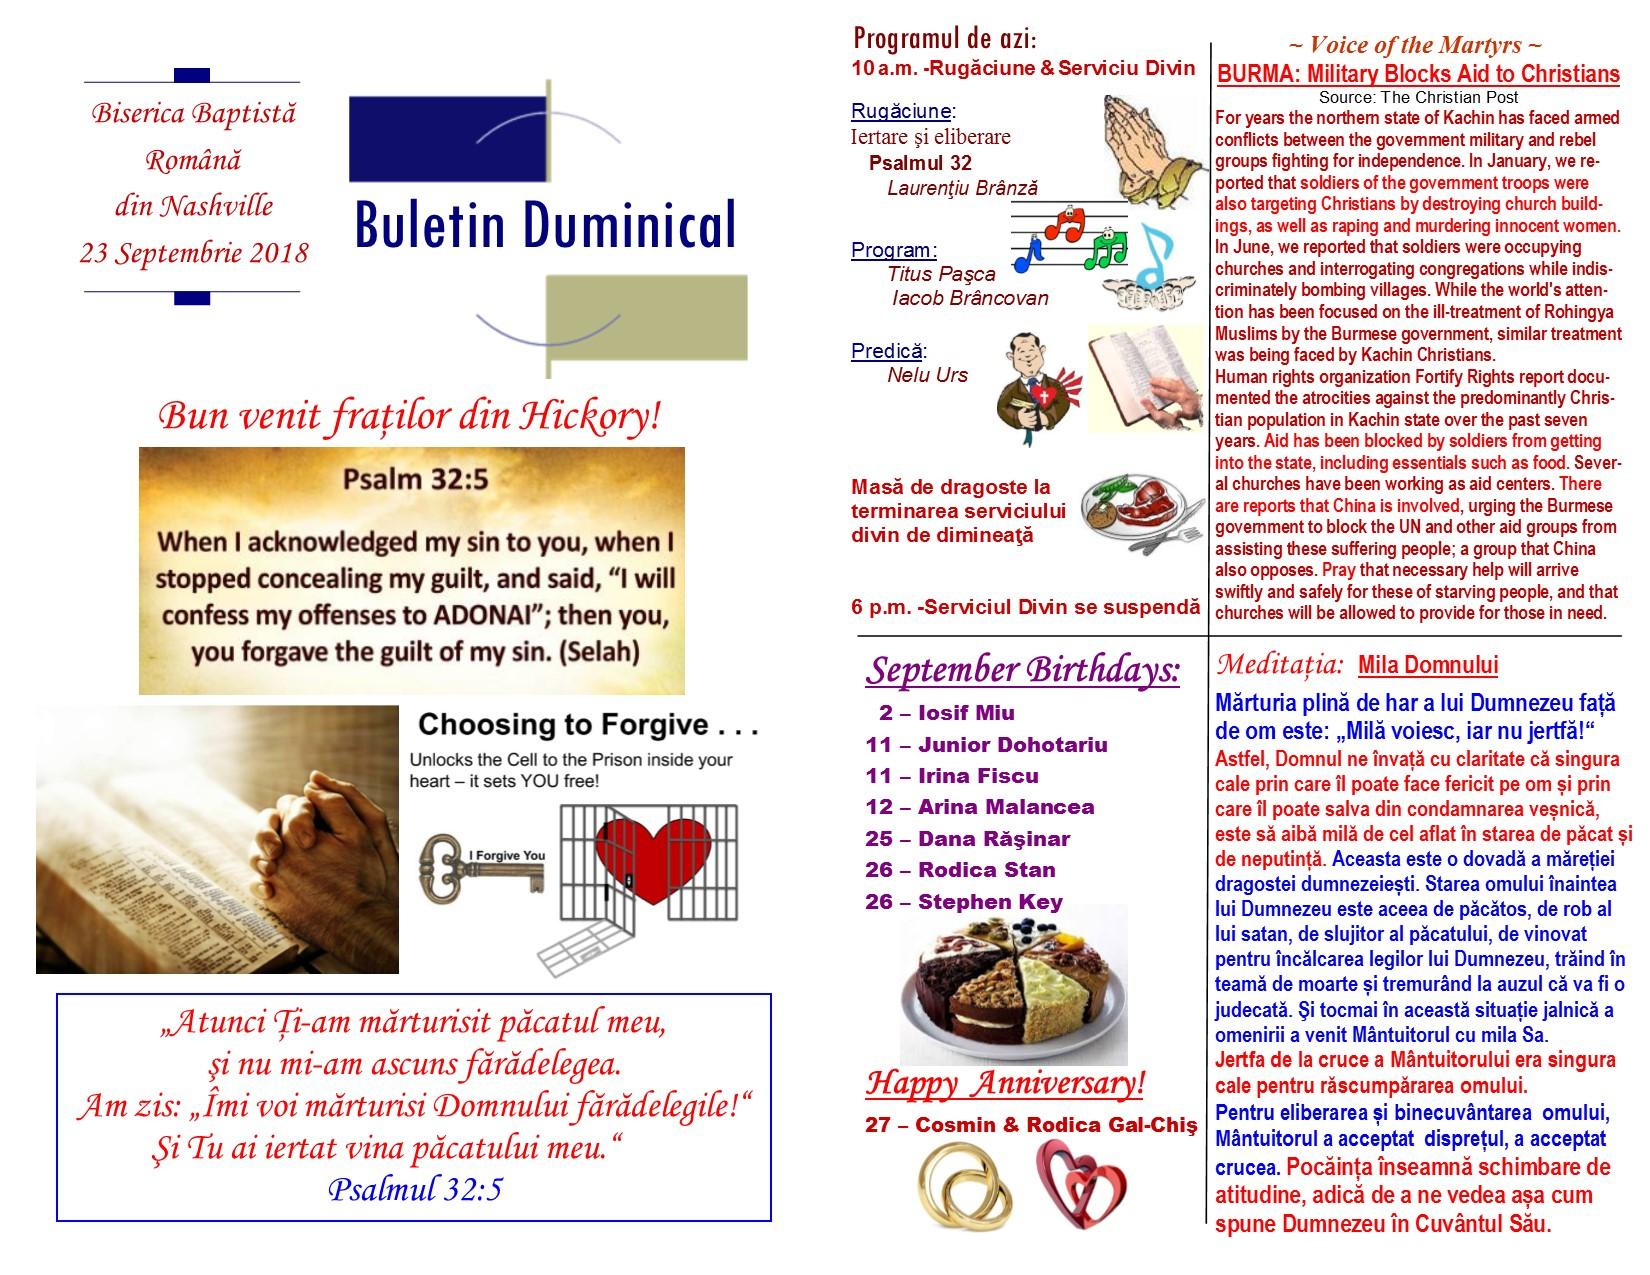 Buletin 09-23-18 page 1 & 2